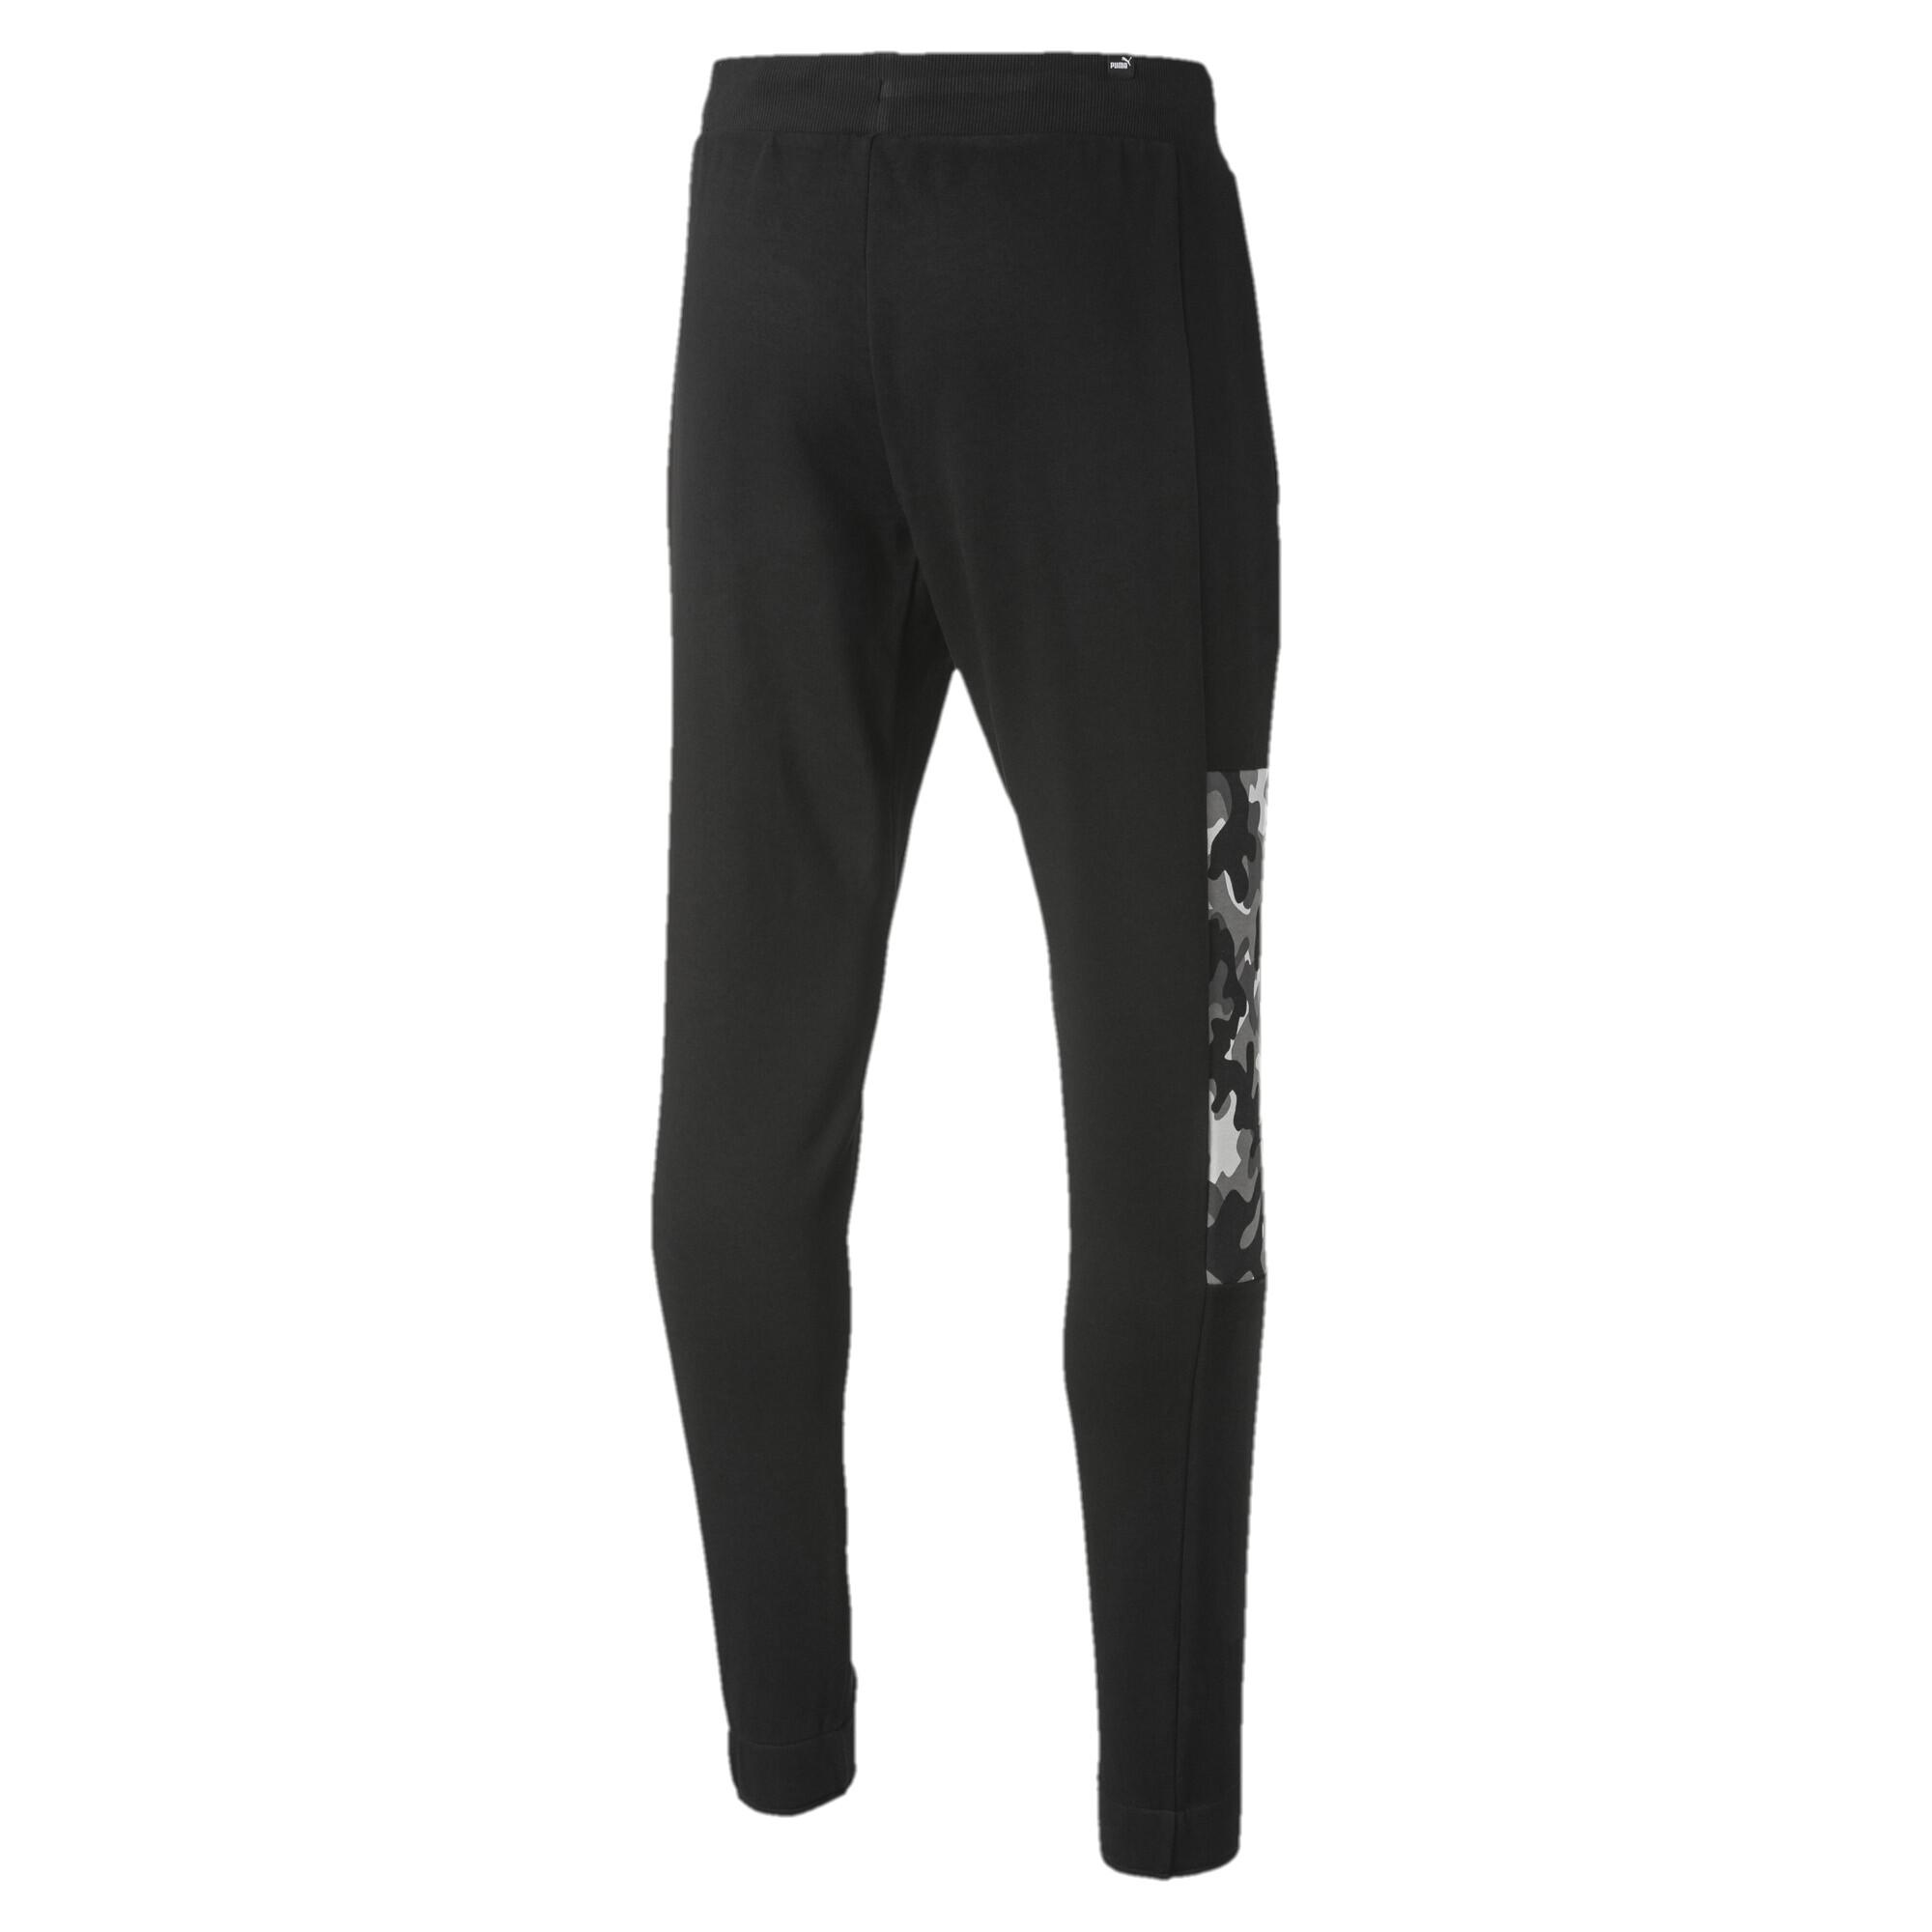 PUMA-Rebel-Camo-Men-039-s-Pants-Men-Knitted-Pants-Basics thumbnail 3